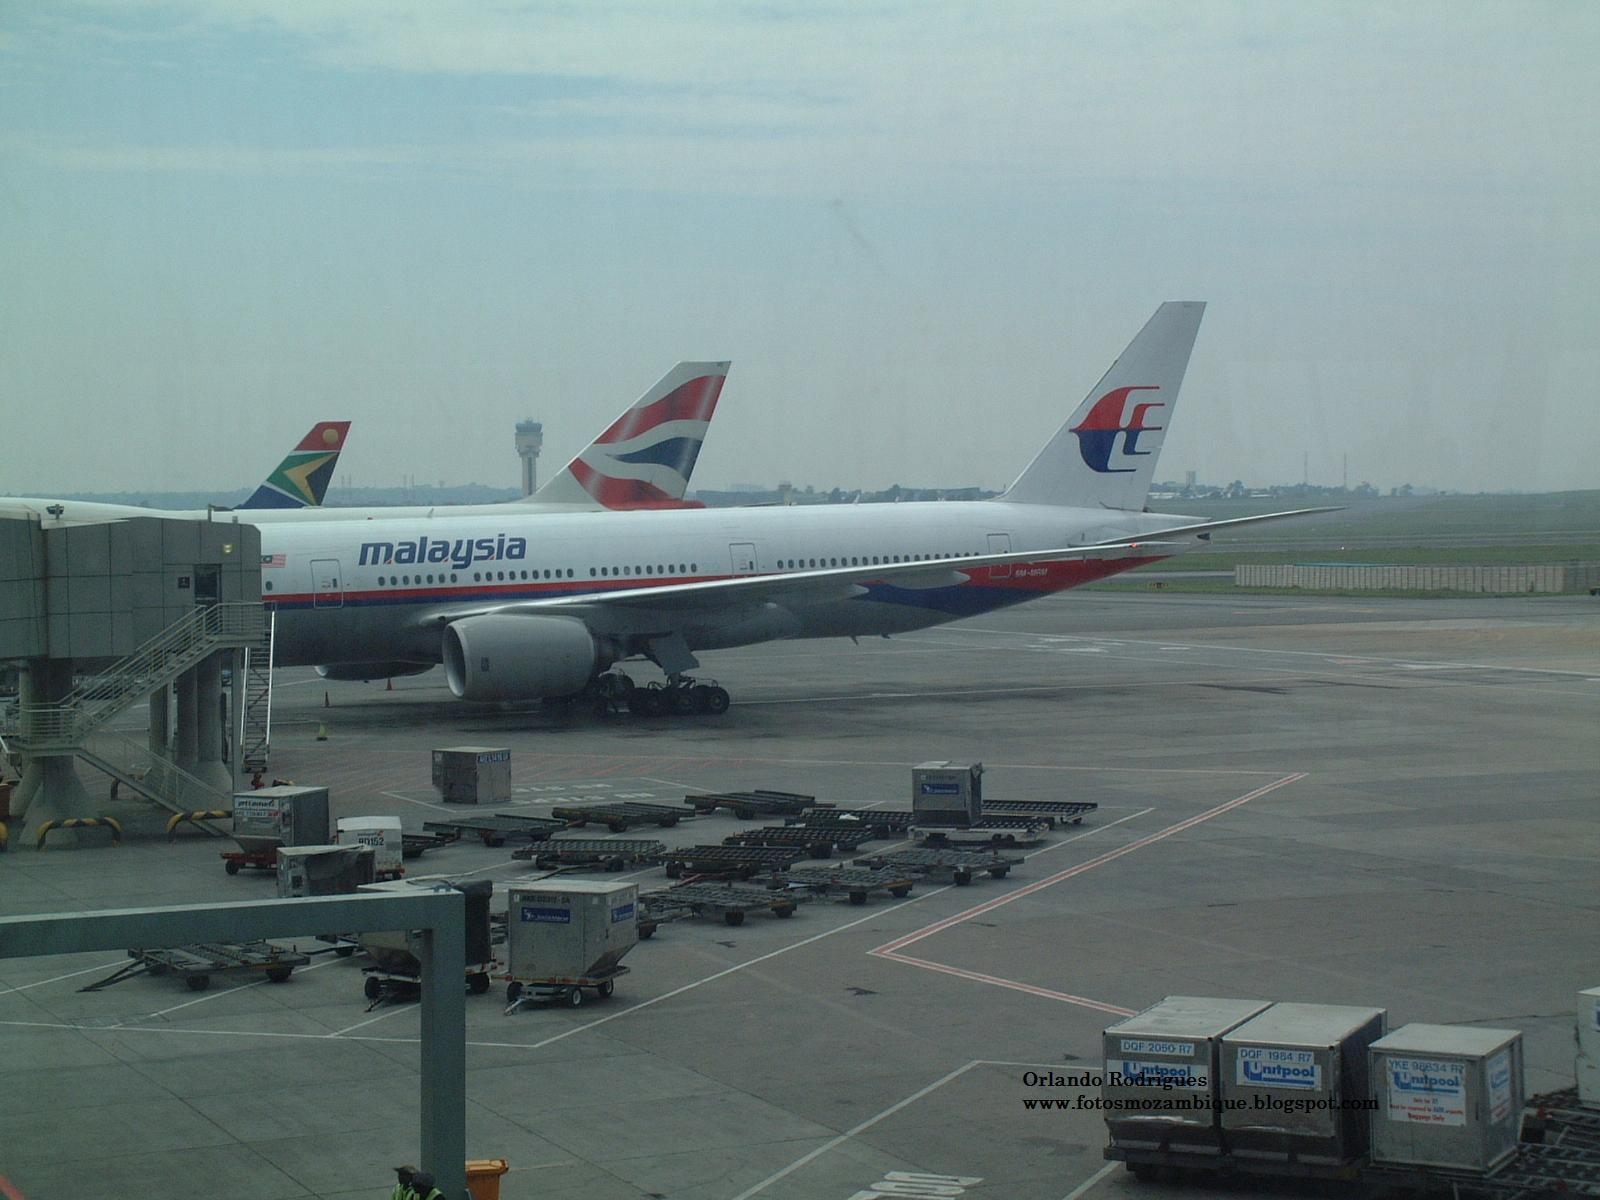 Aeroporto Johannesburg : MoÇambique hoje epÍlogo